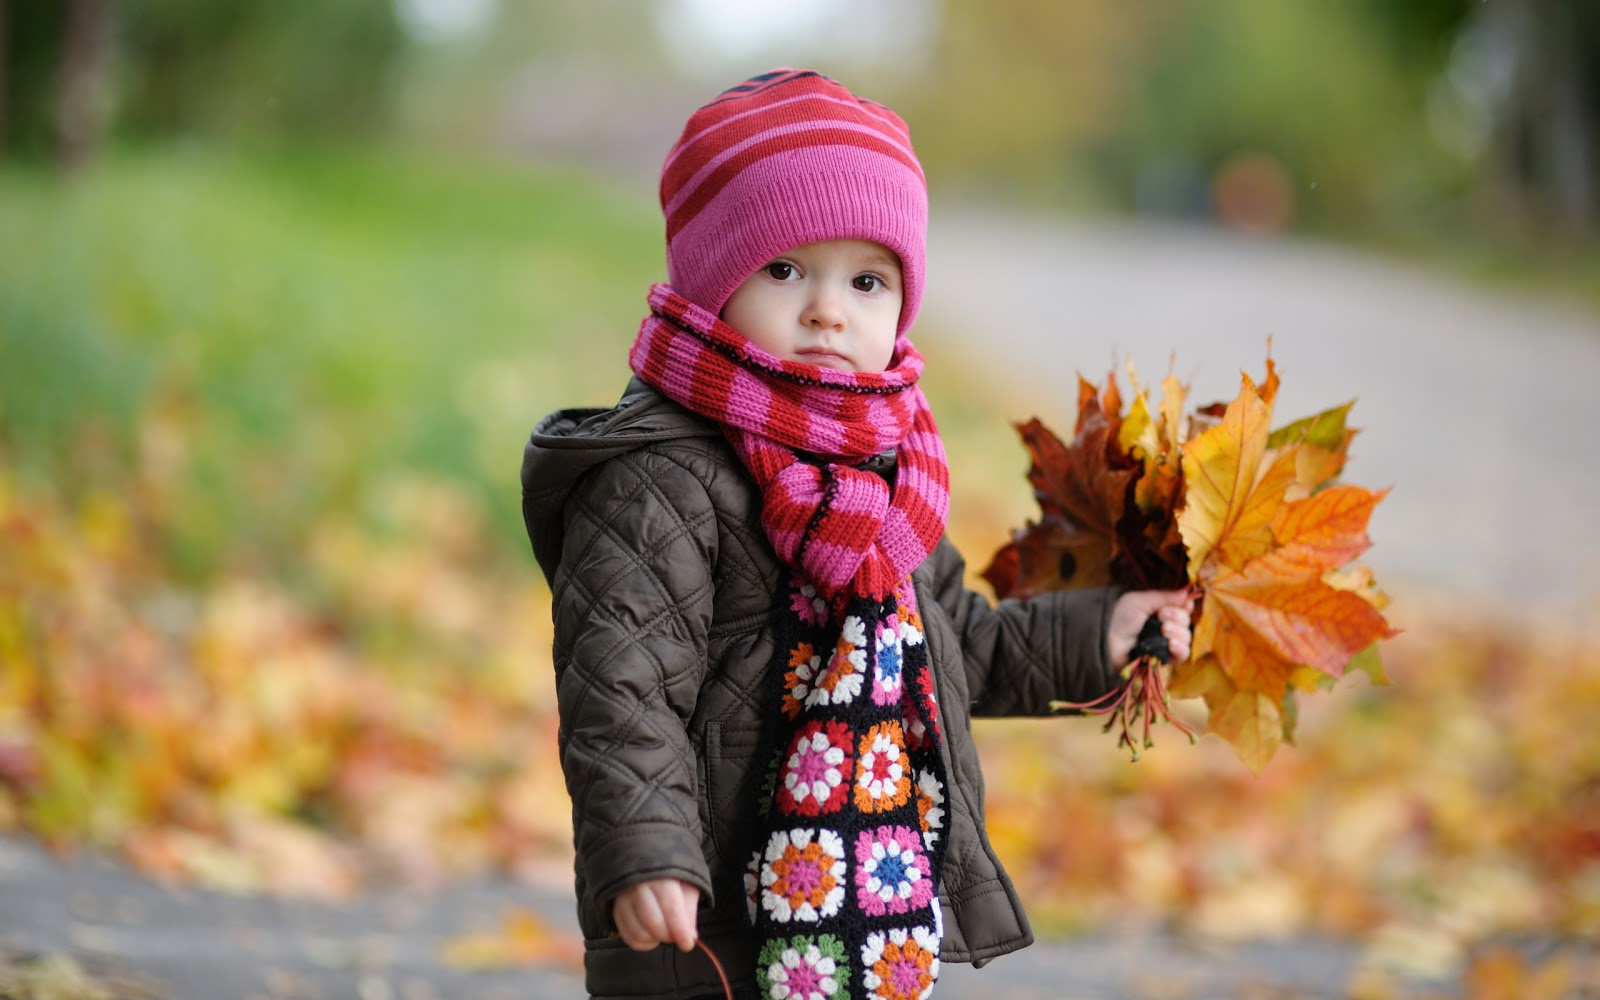 http://1.bp.blogspot.com/-C4HvwSM5sxI/UN6_ZZ8AJQI/AAAAAAAAA5Q/us-ozCsQ4Ak/s1600/cute_baby_in_autumn-wide.jpg